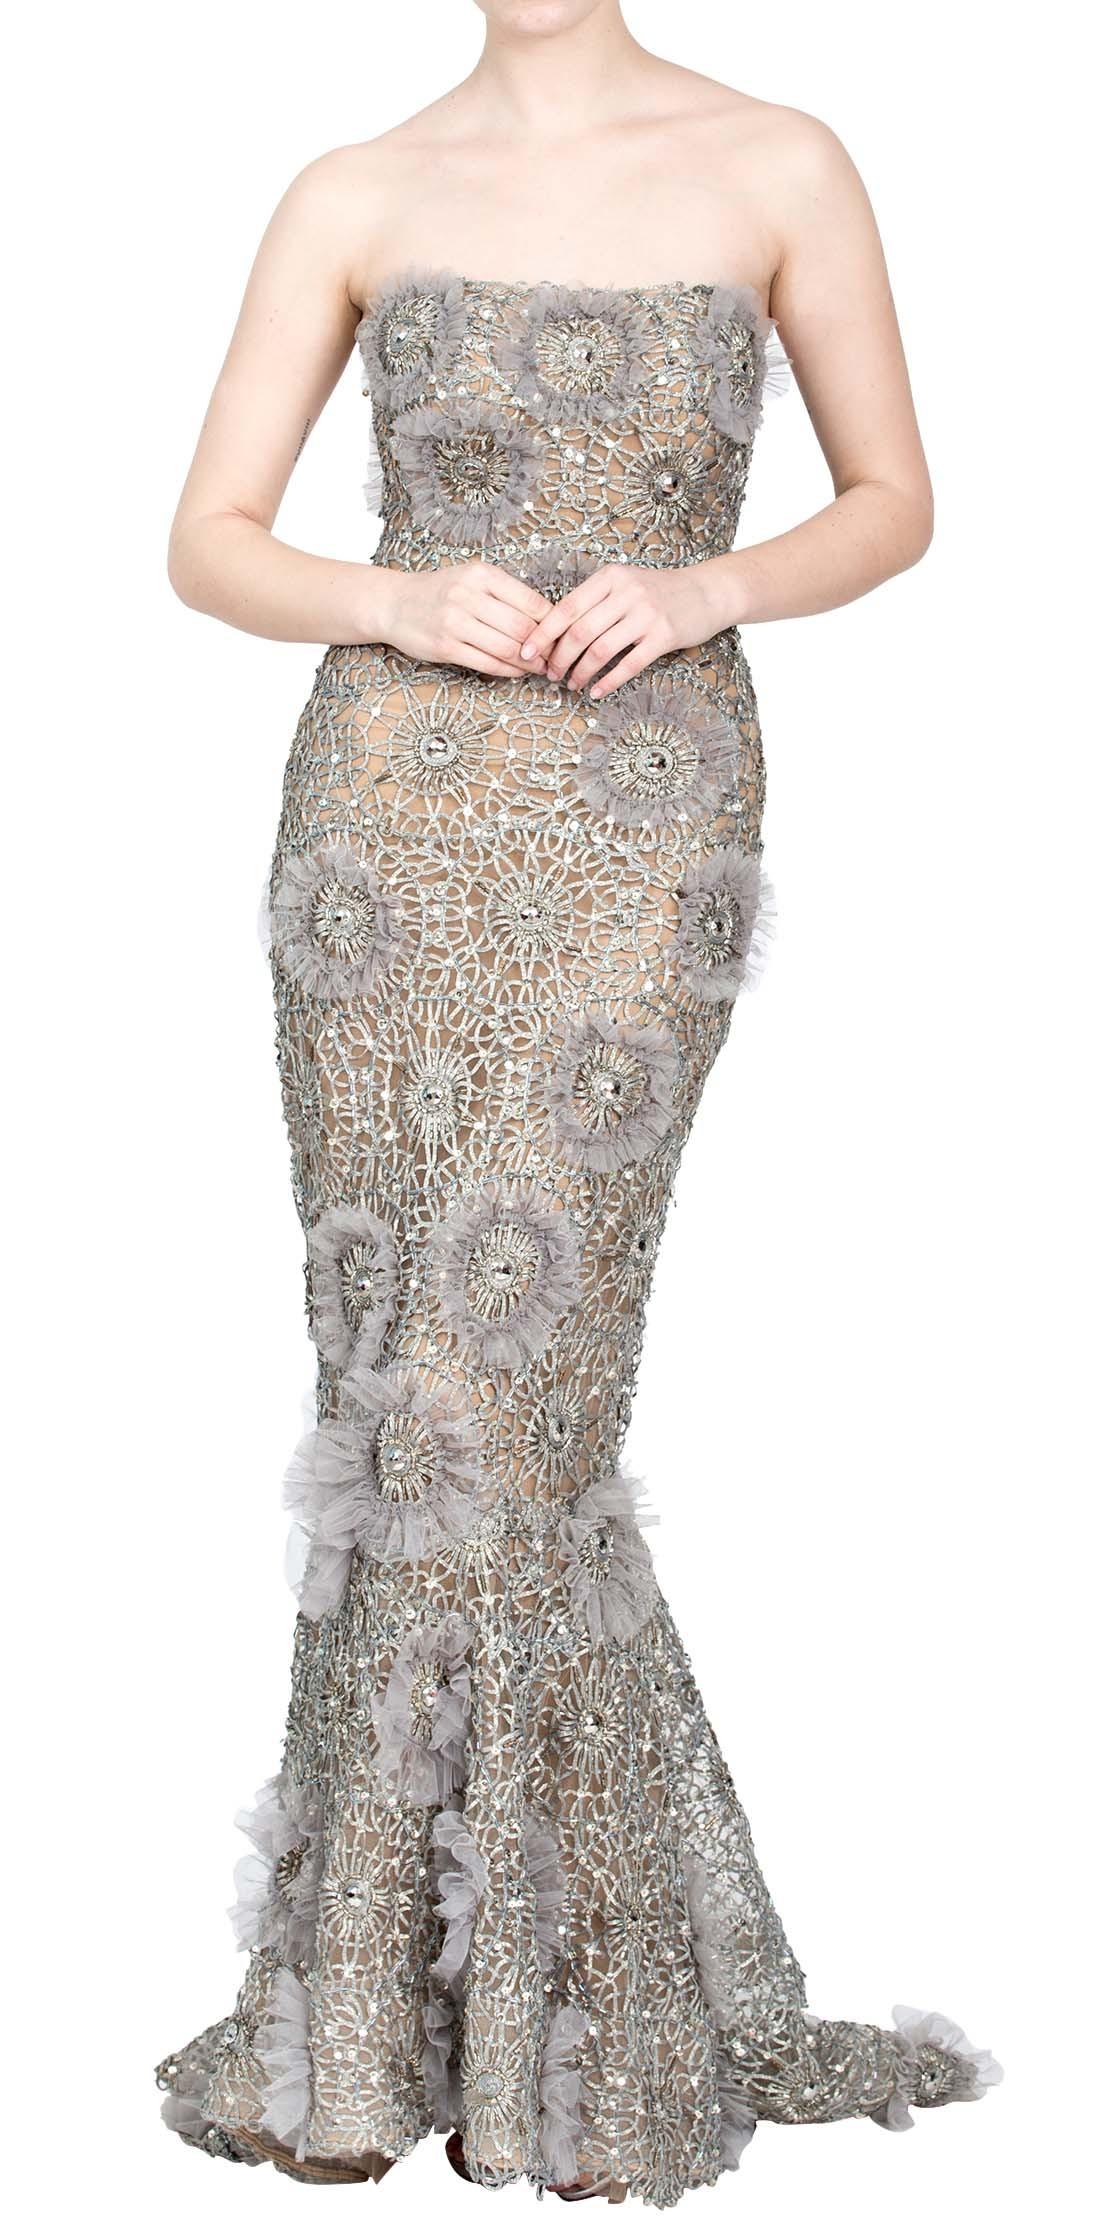 Strapless Sequined Gown | Evening Dresses Rental | Dubai Rent a ...